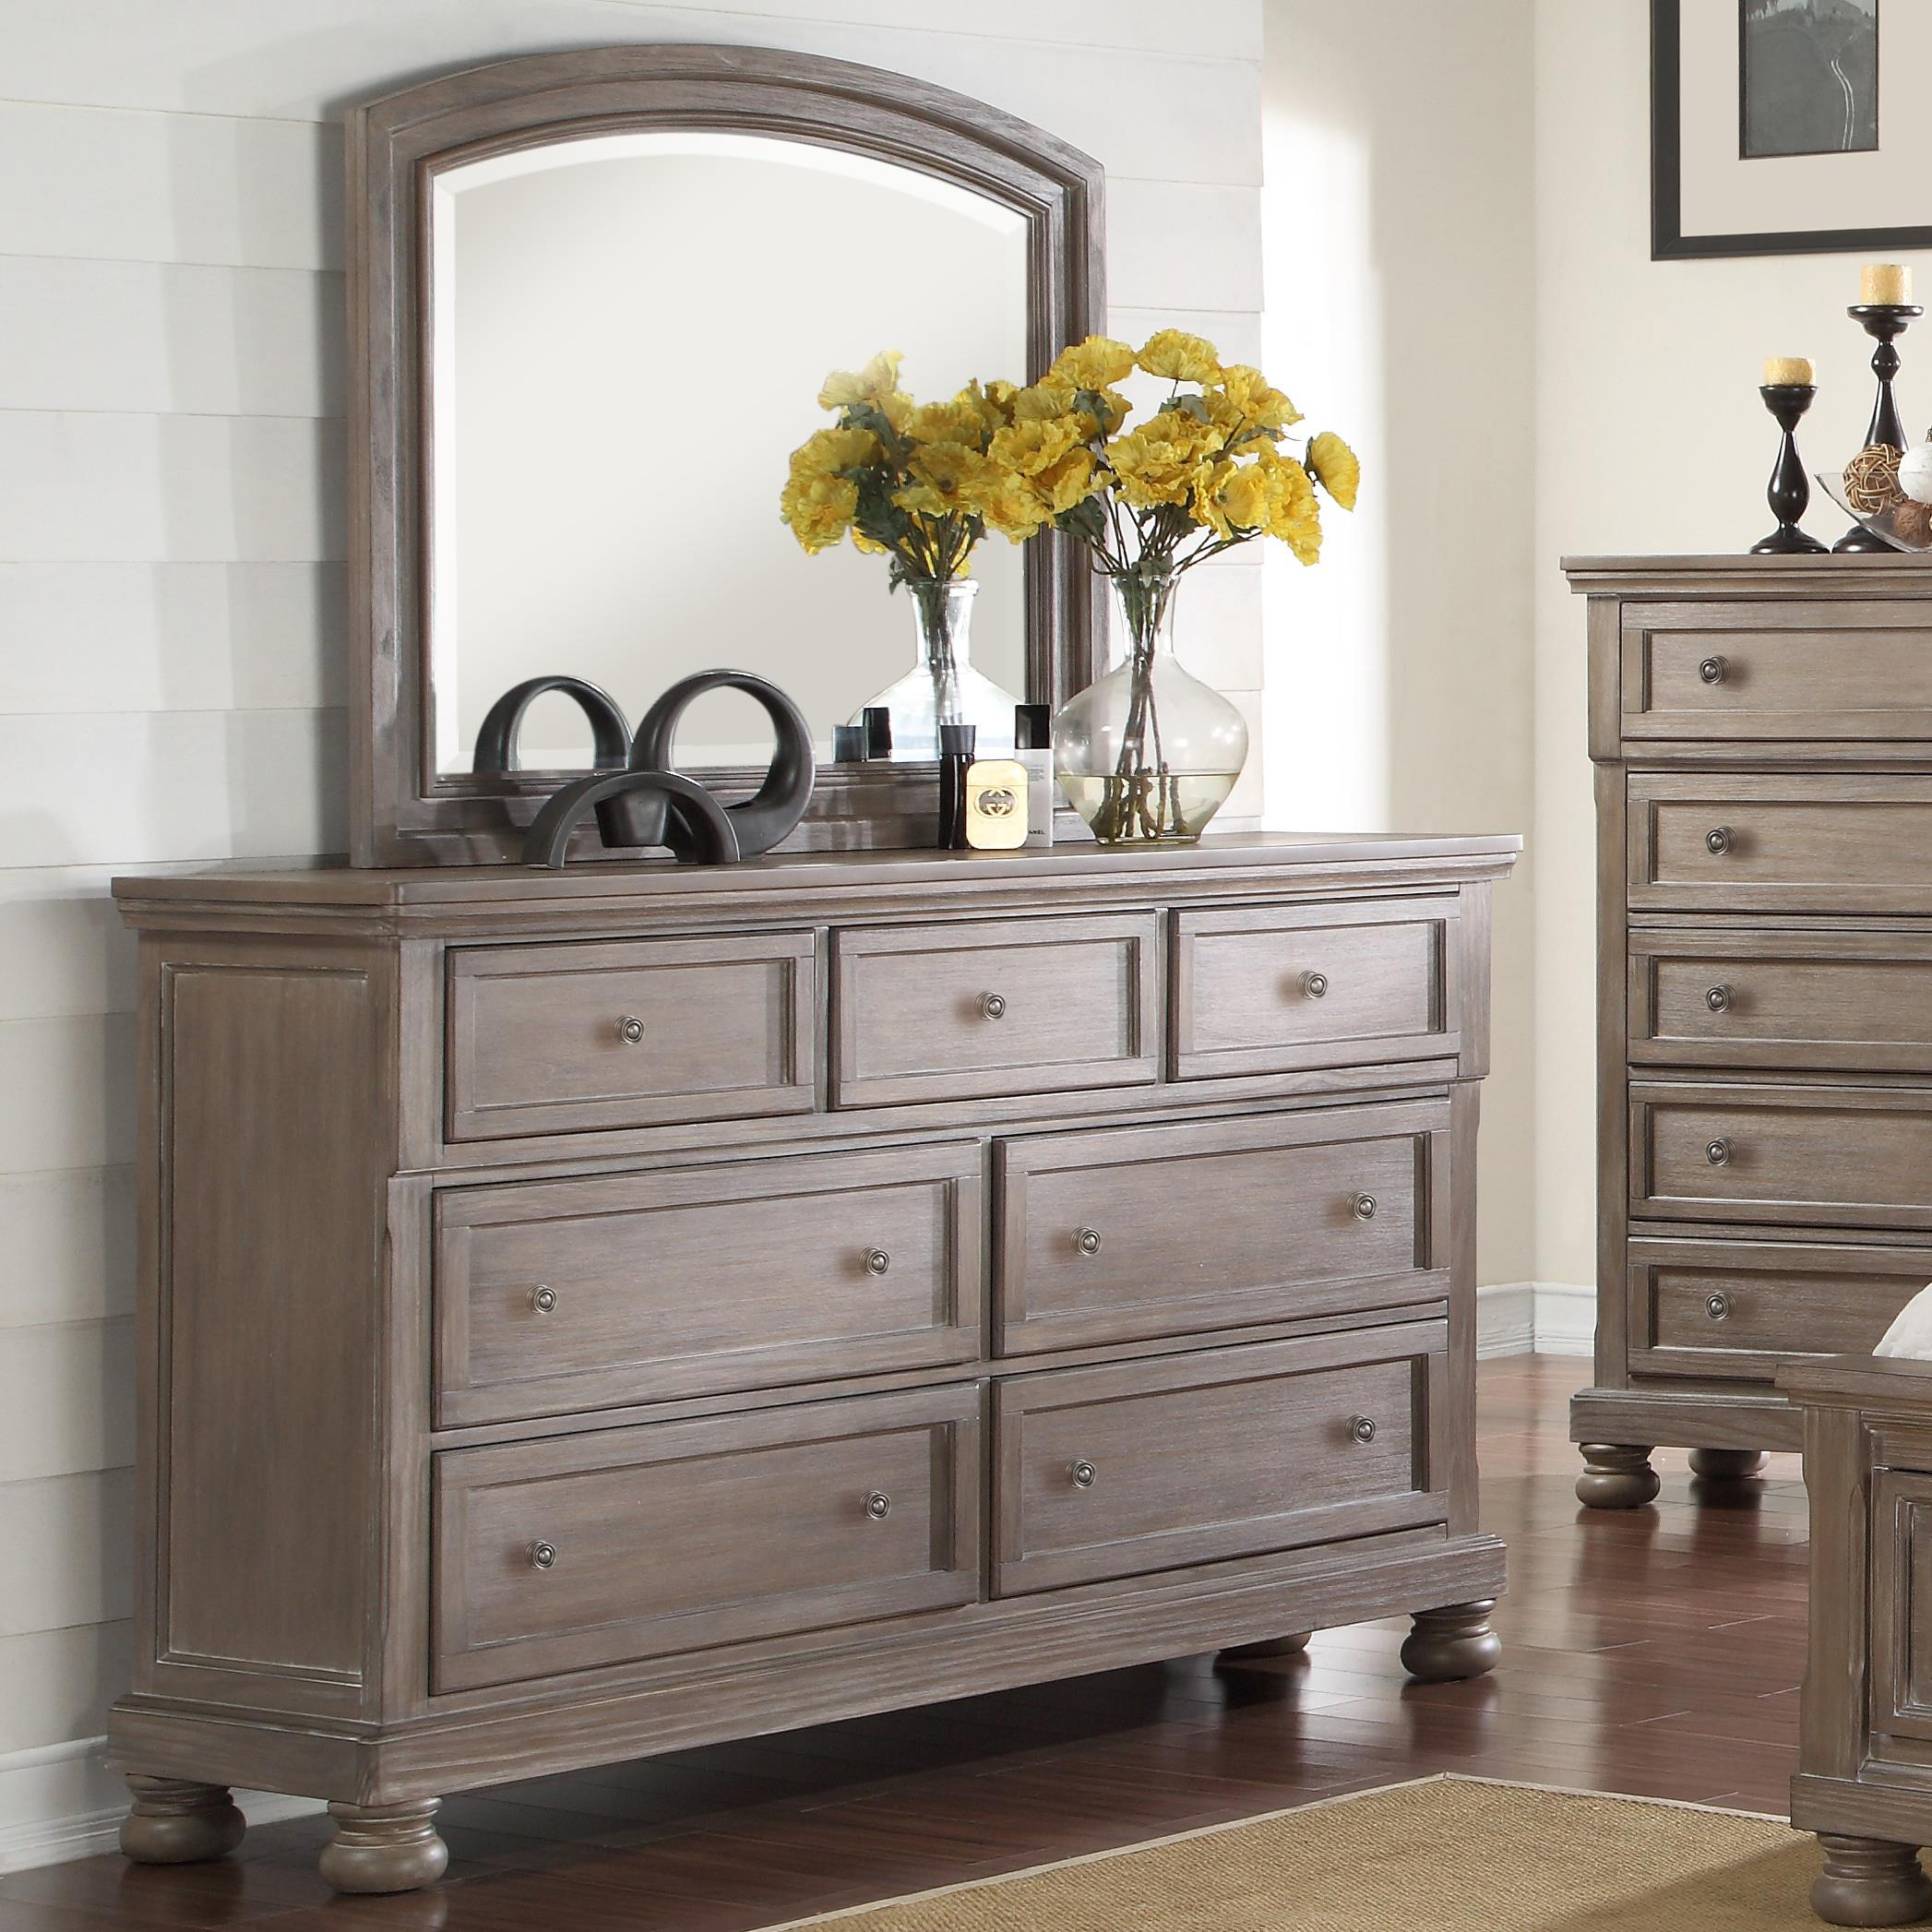 Allegra Dresser & Mirror Set by New Classic at Beds N Stuff